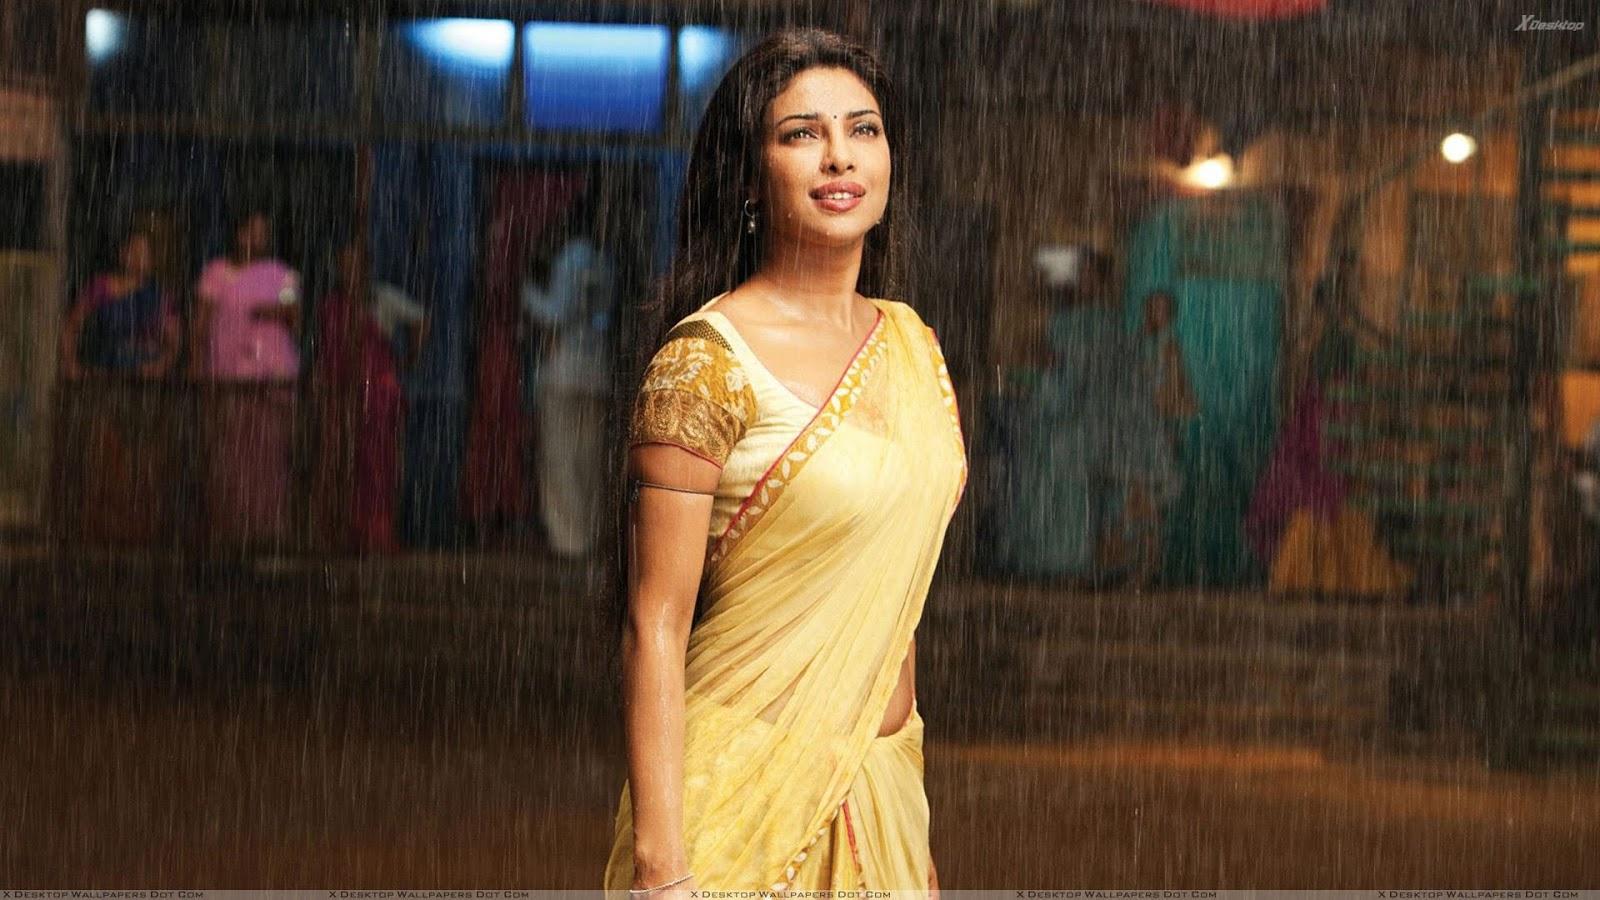 Priyanka Chopra hot in Agneepath, Priyanka Chopra in yellow saree, Priyanka Chopra in Agneepath